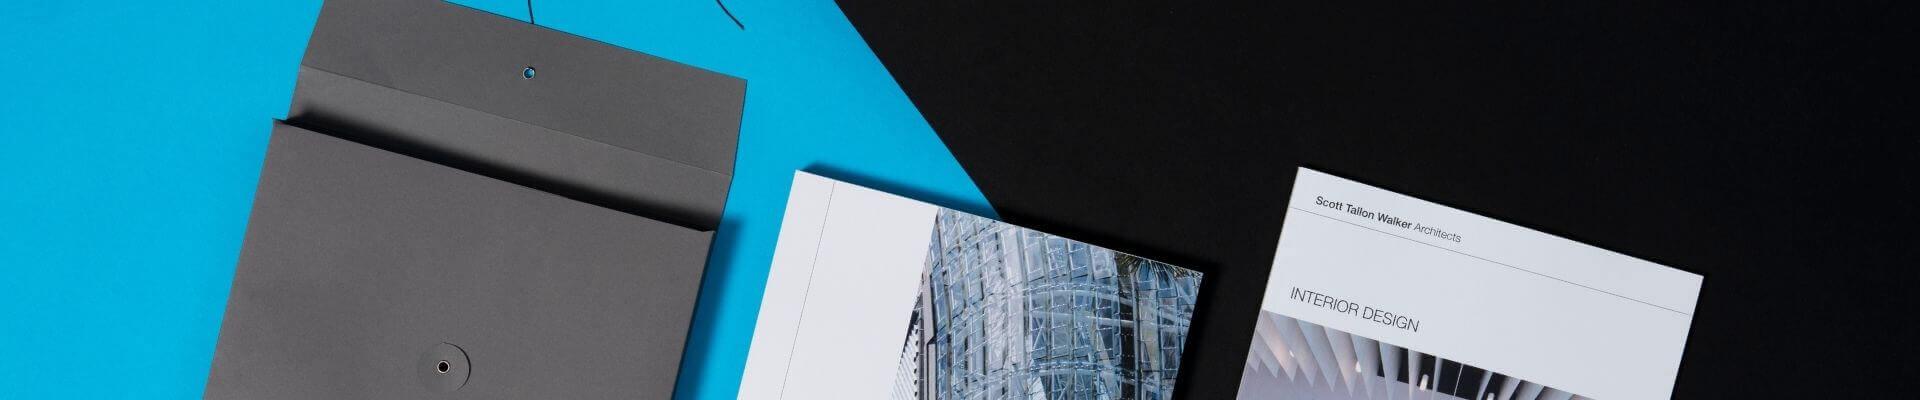 Personalisation - Bespoke - Folders & Cases